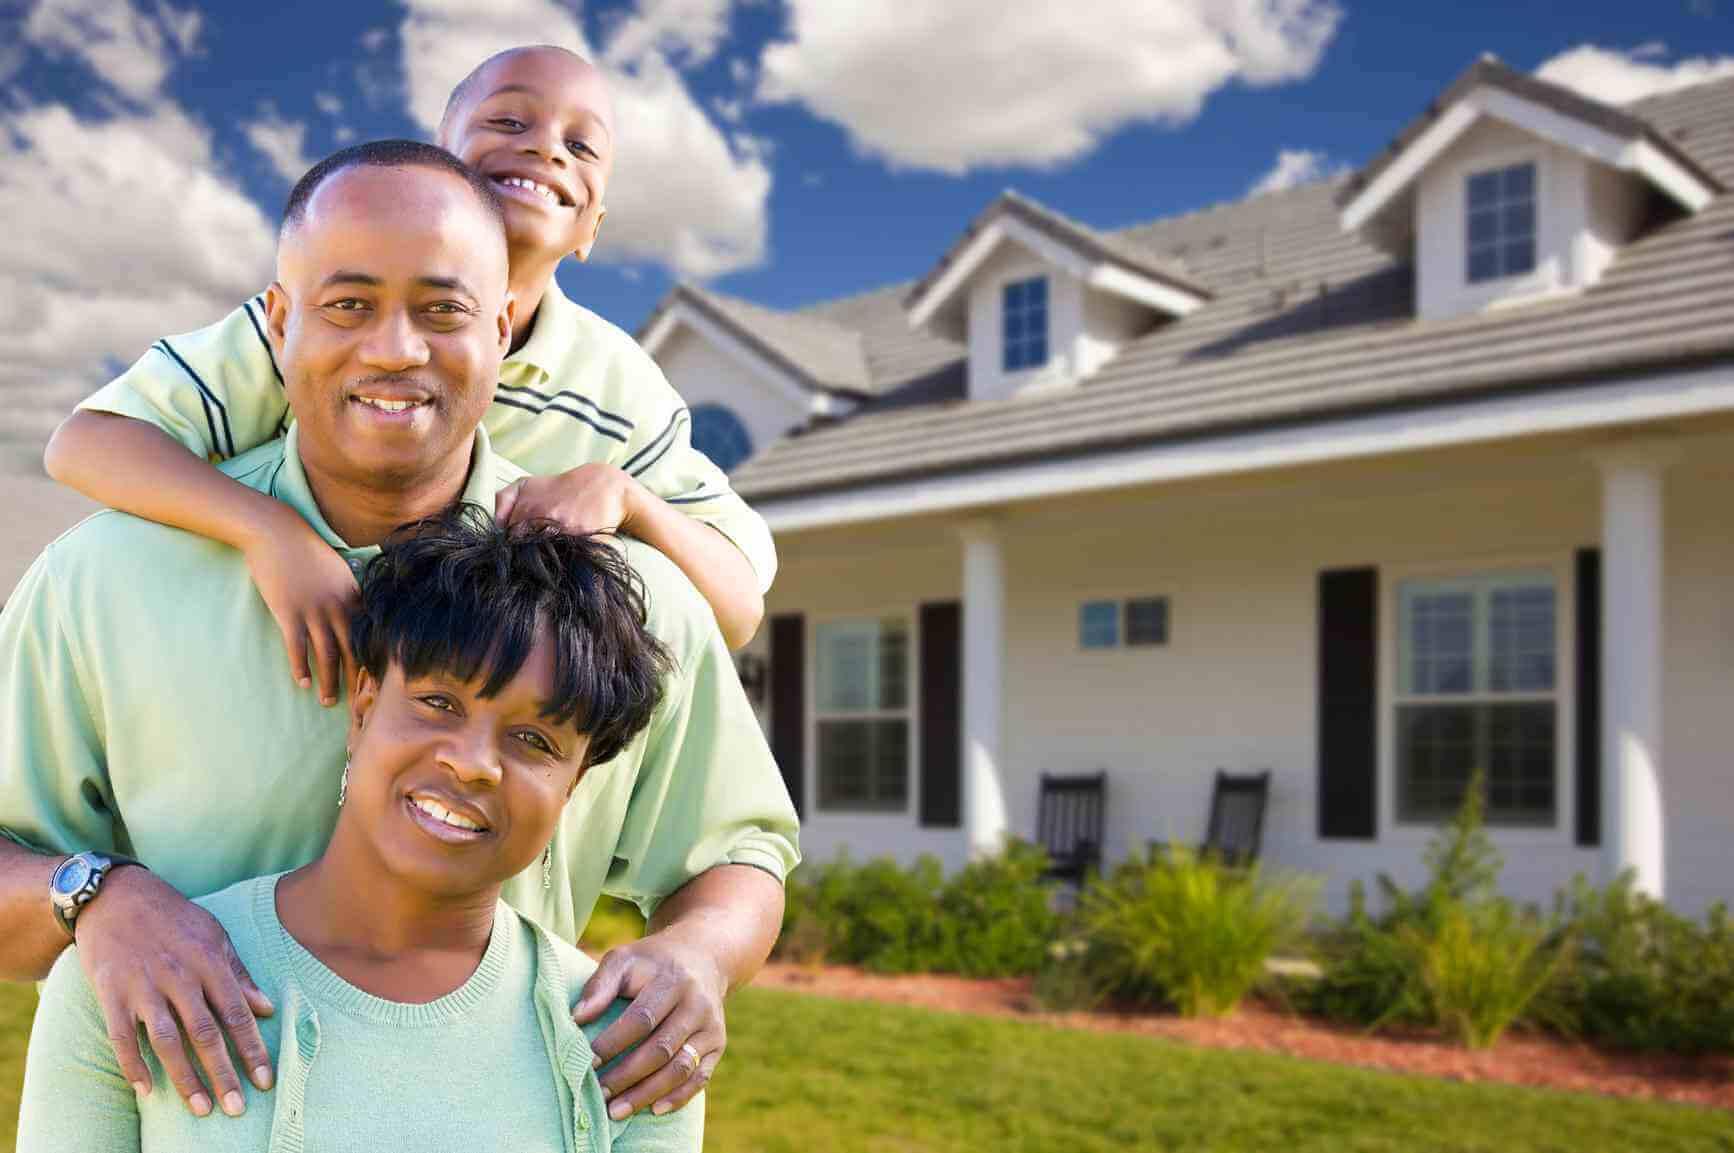 Homeowners Insurance Checklist & Insurance Savings Tips